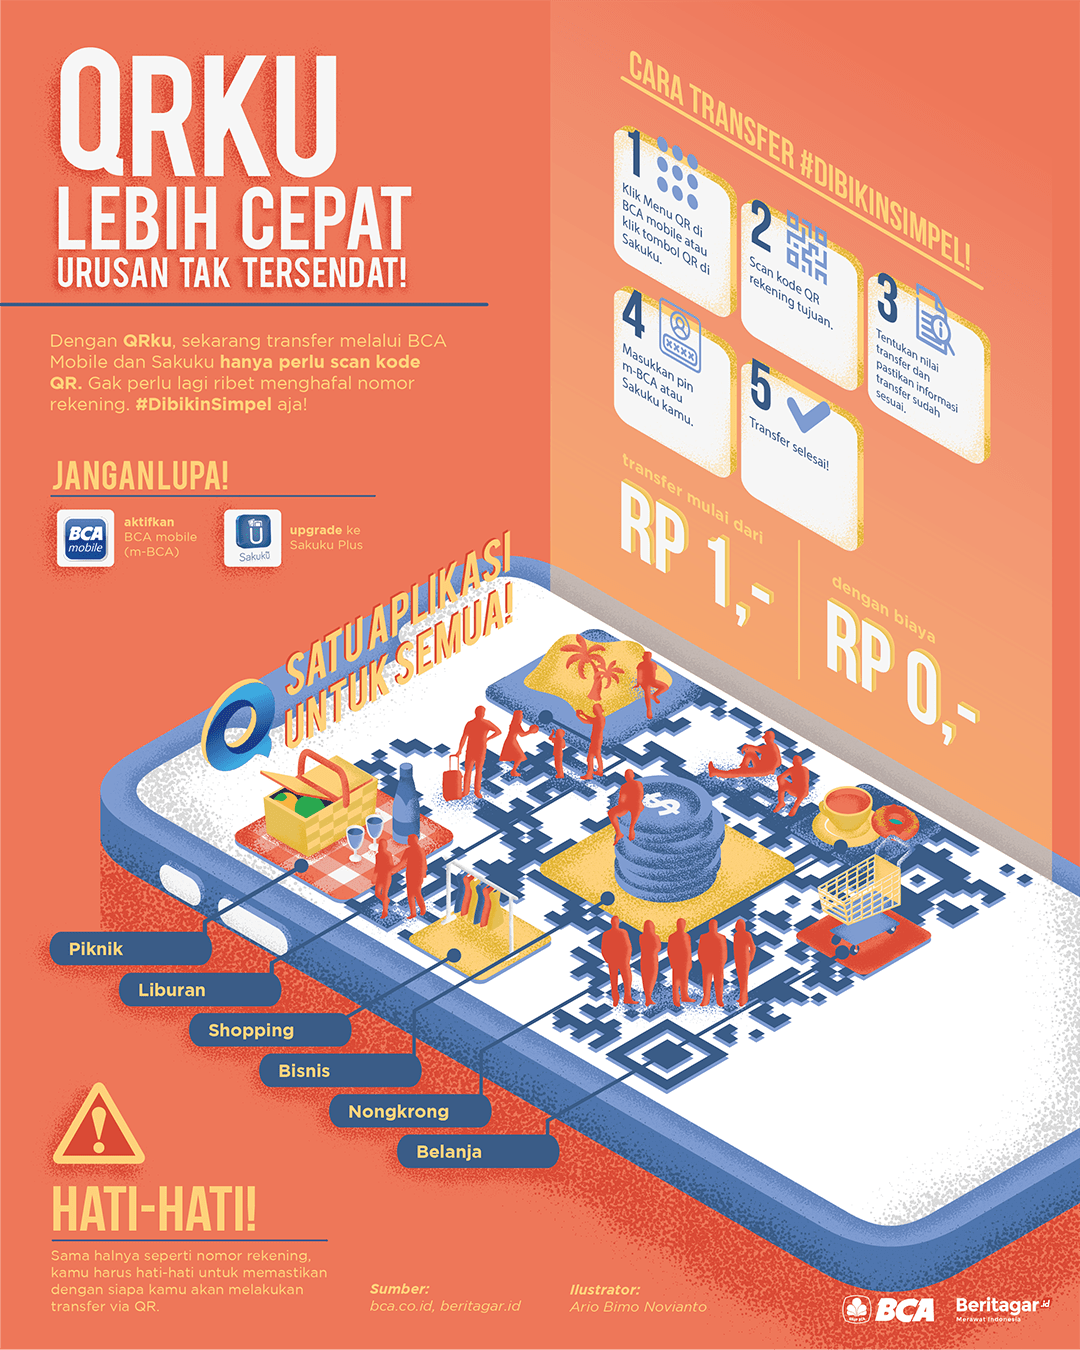 Beritagar Infographic